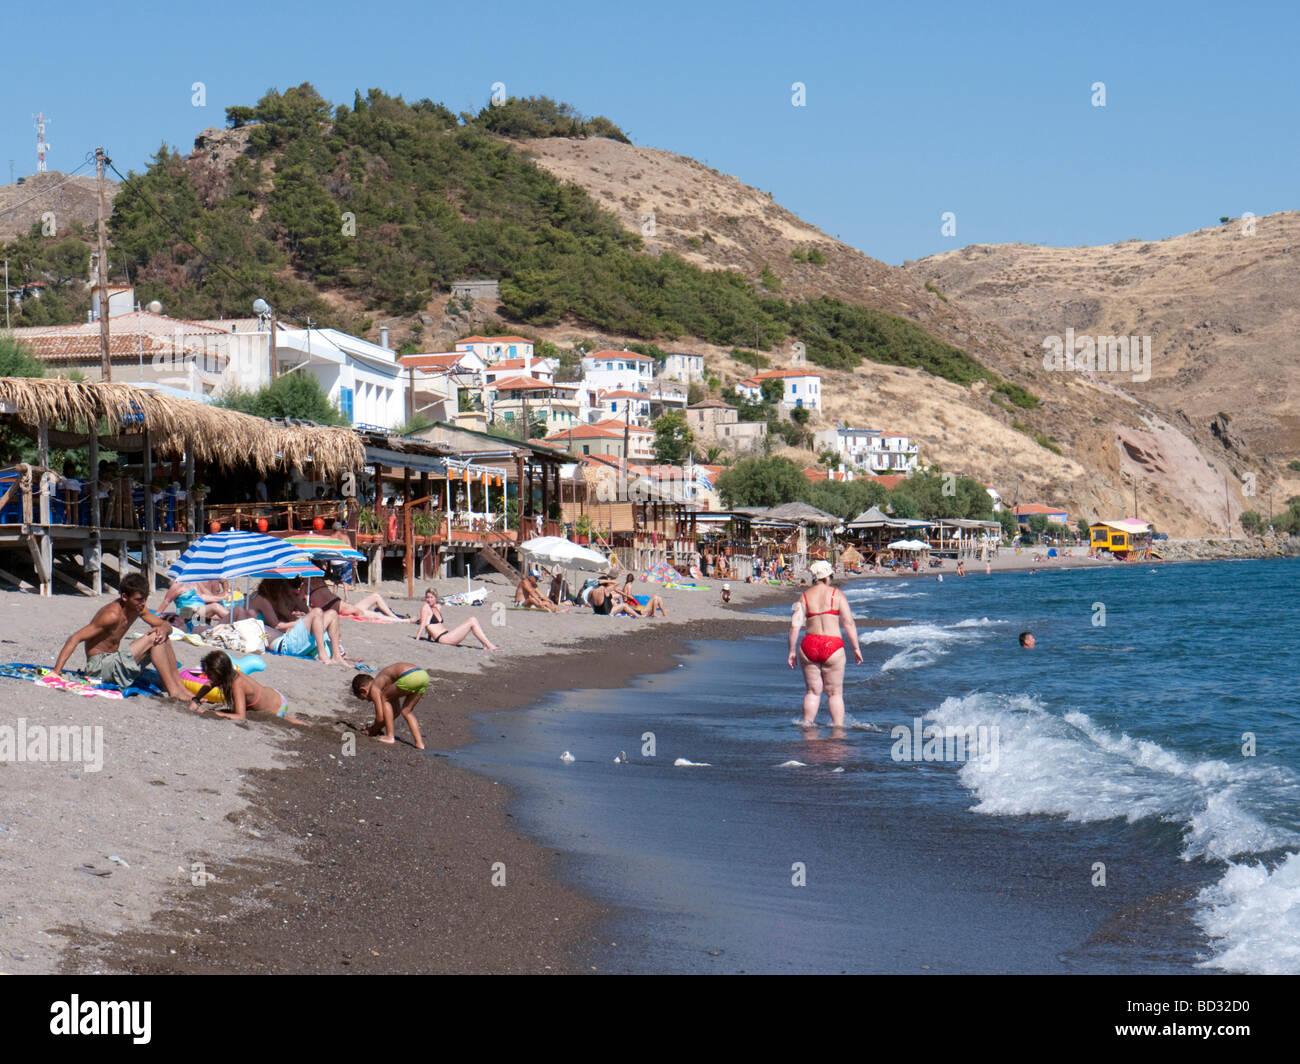 Beach resort at small village of Skala Eresou on Lesvos Island in Greece - Stock Image